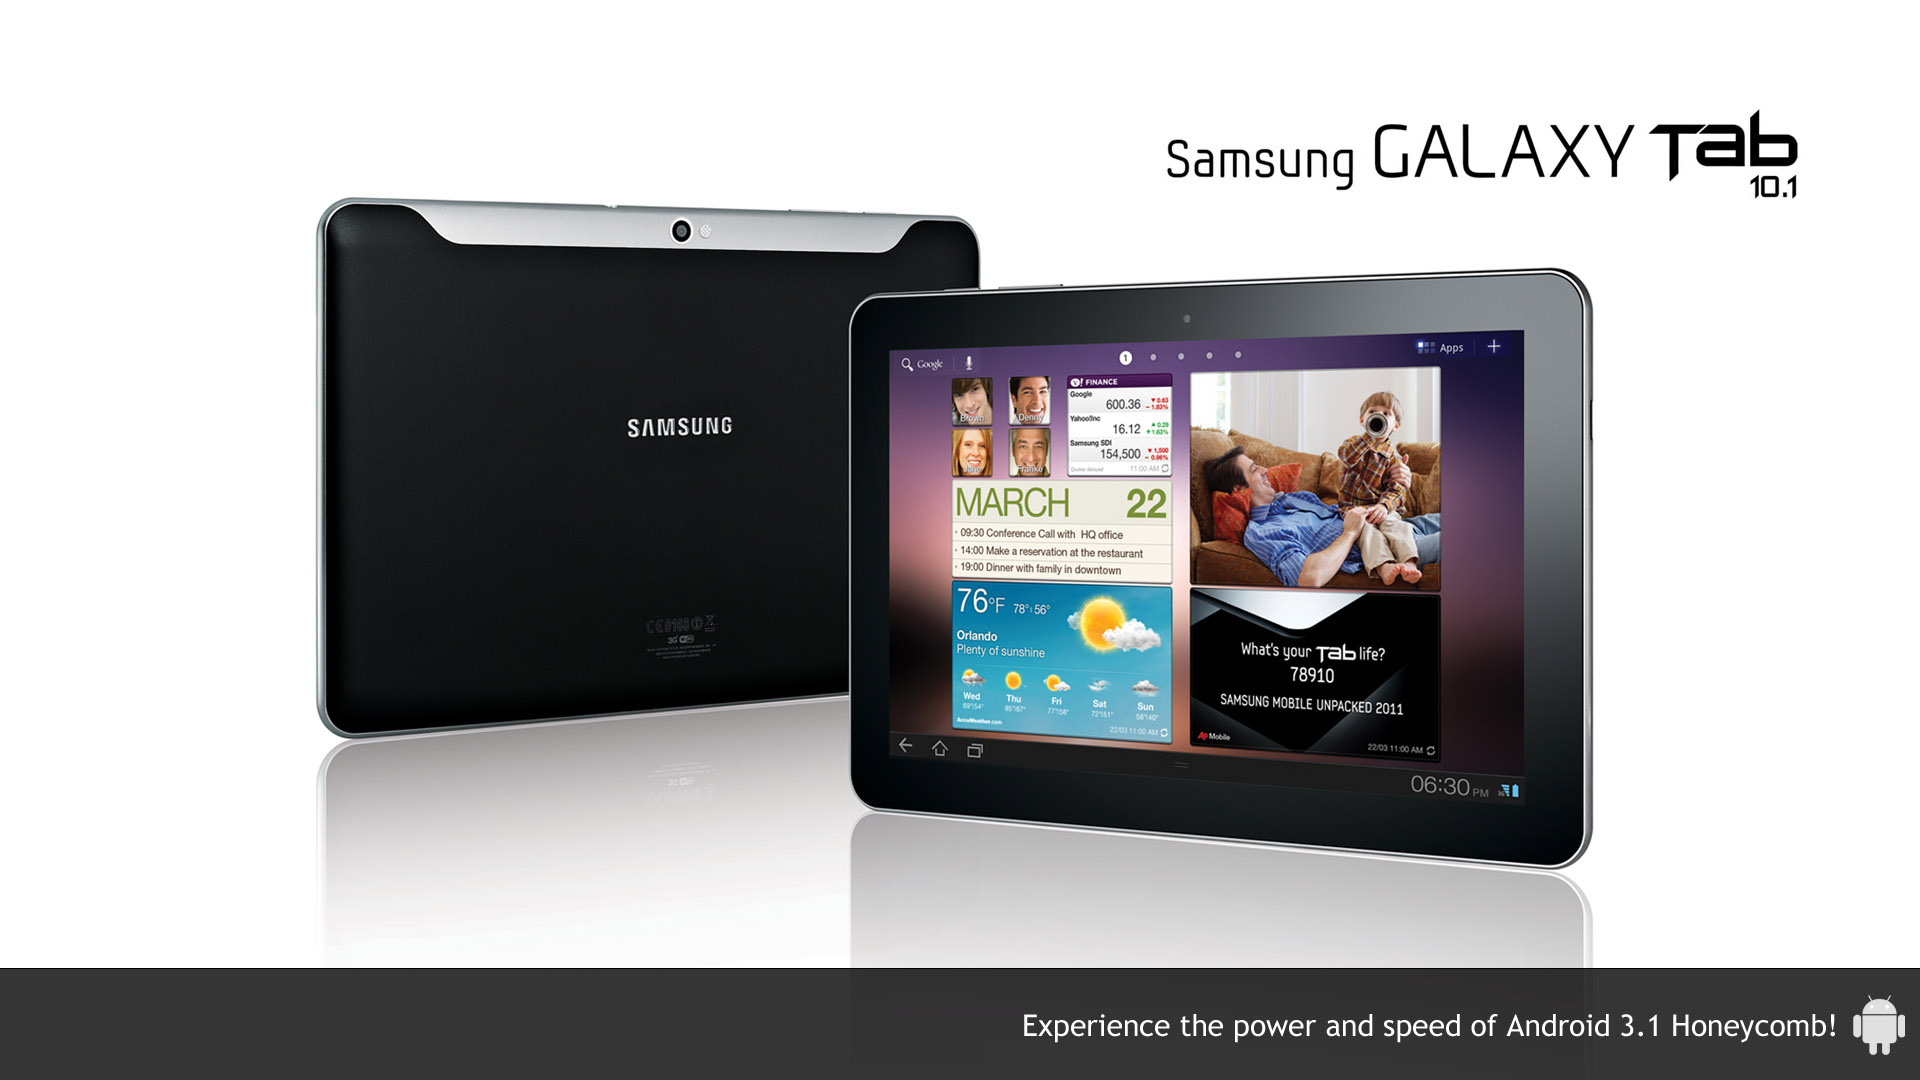 Tab Samsung Galaxy Tab 101 Samsung Galaxy Tab 101 Wallpaper 1920x1080